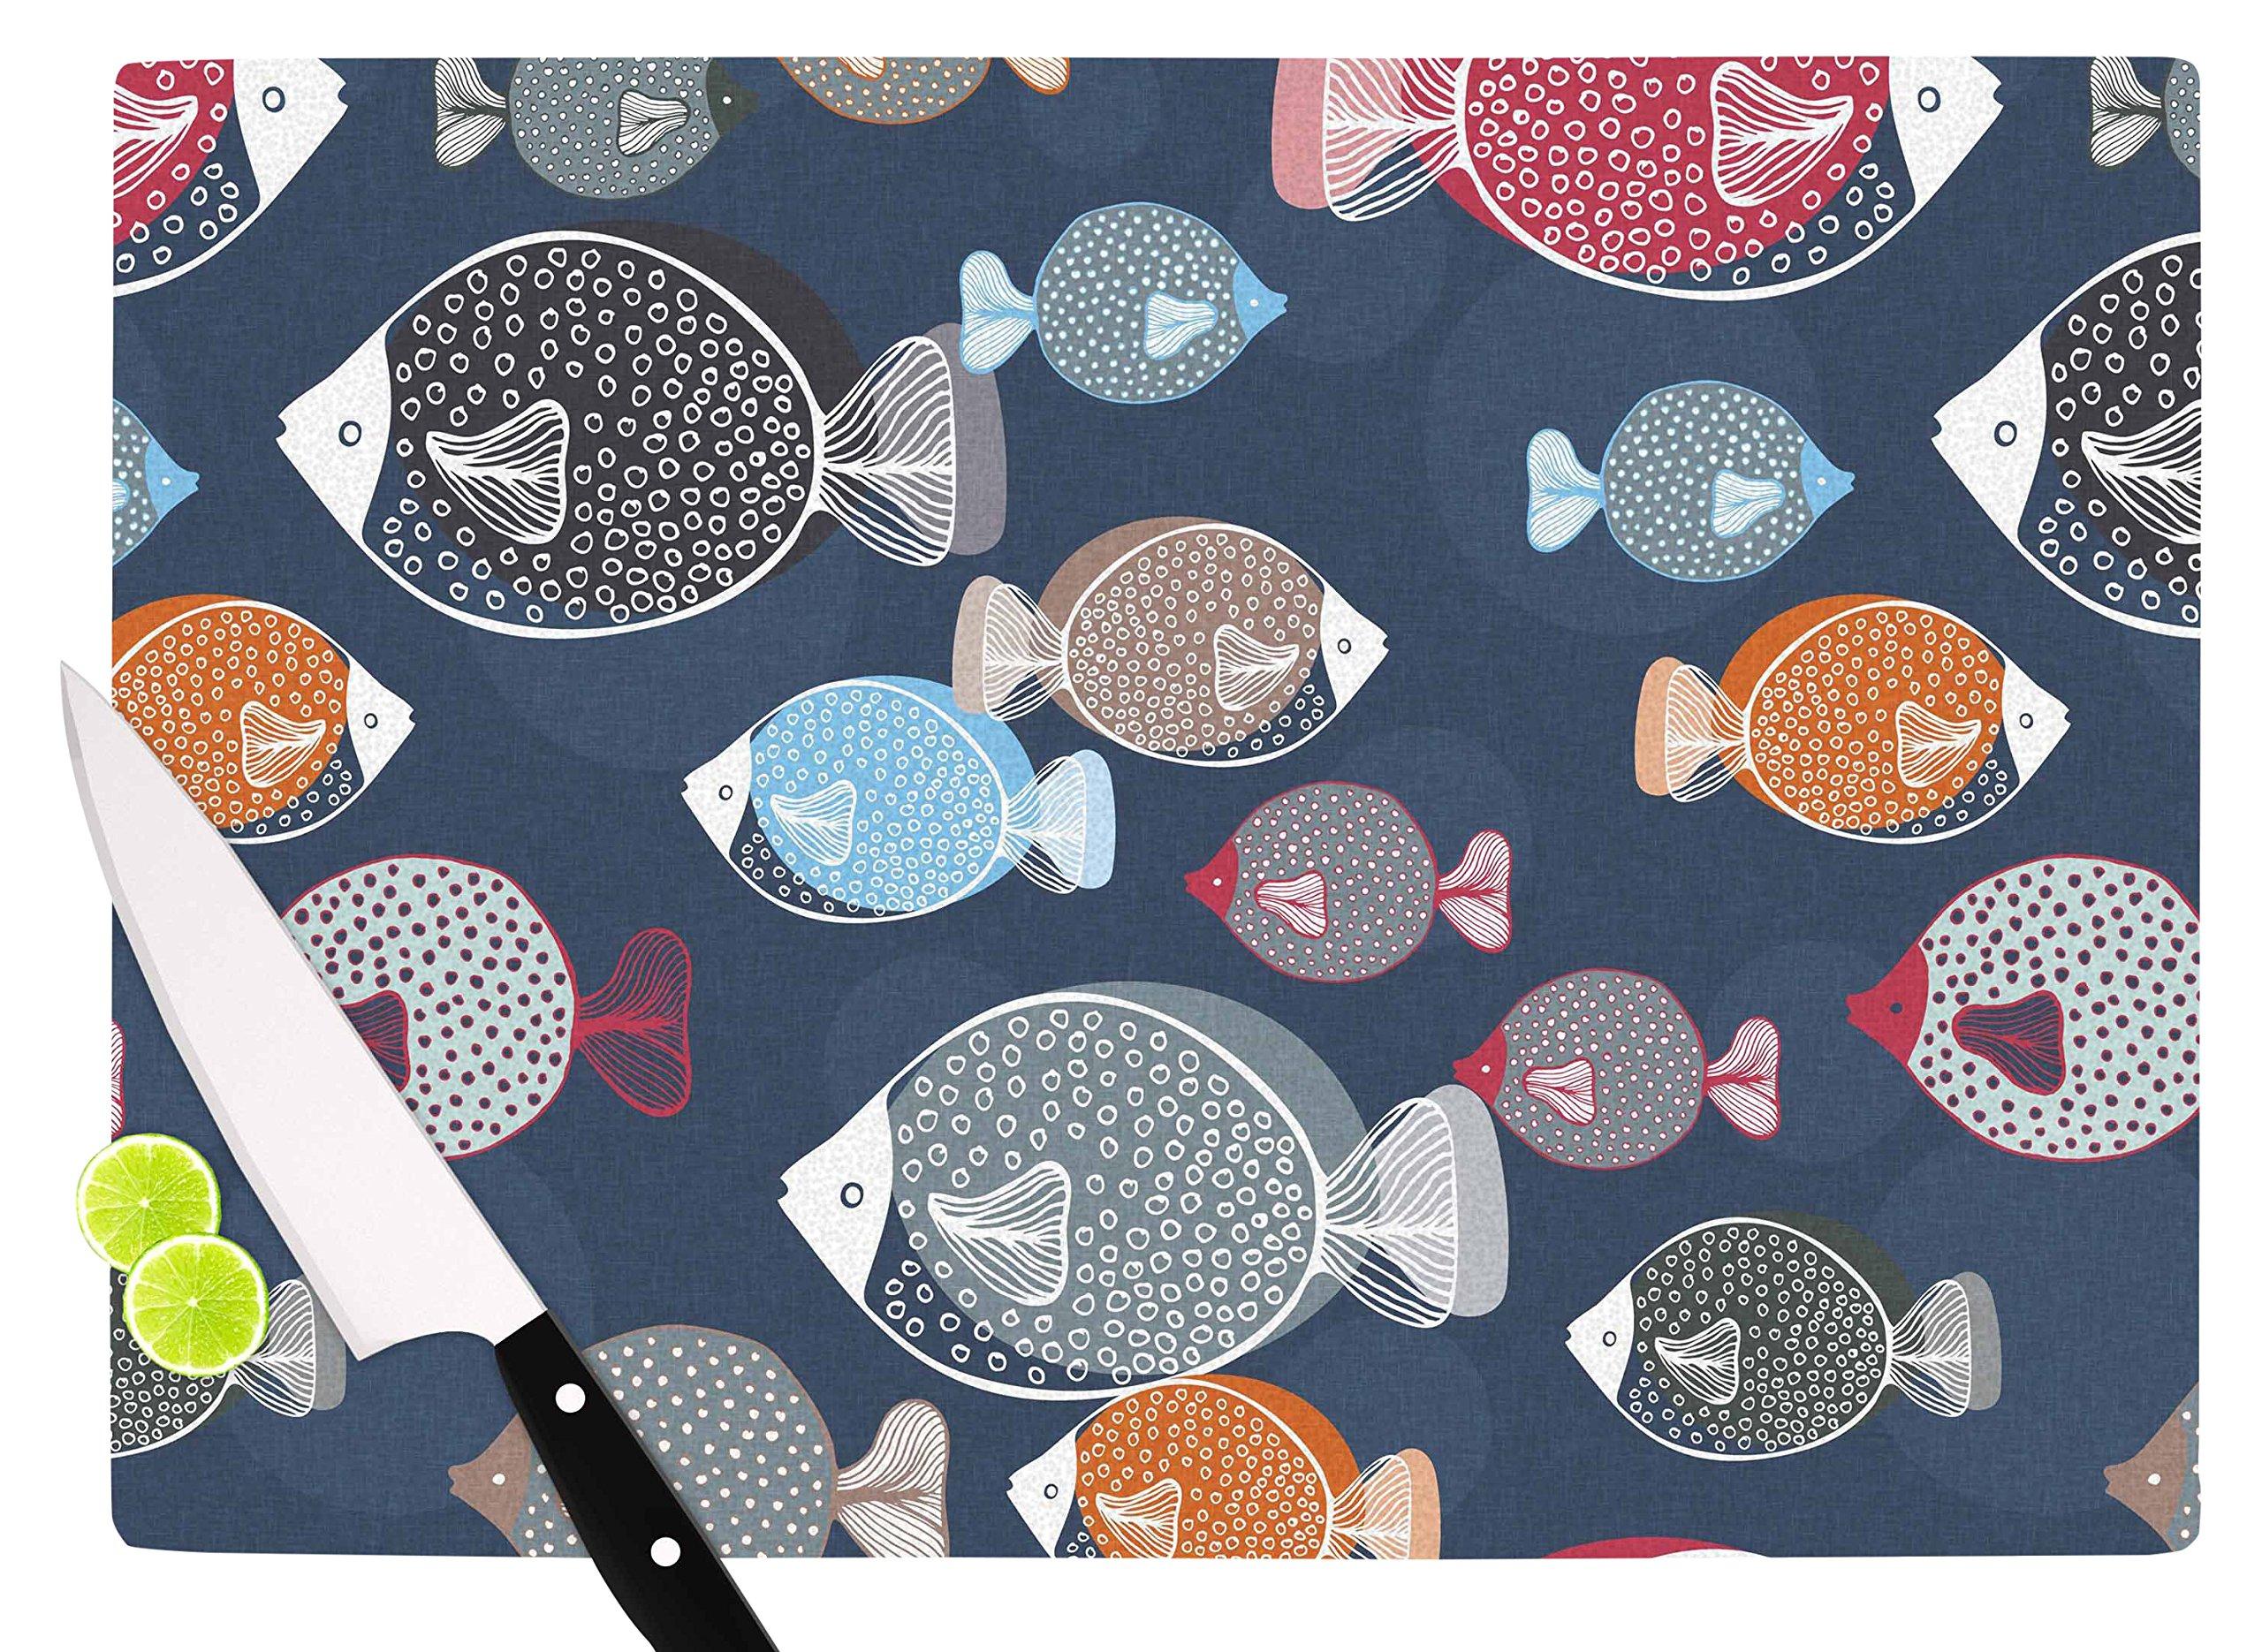 KESS InHouse Melissa Armstrong ''Swim School'' Blue Red Cutting Board, 11.5'' x 15.75'', Multicolor